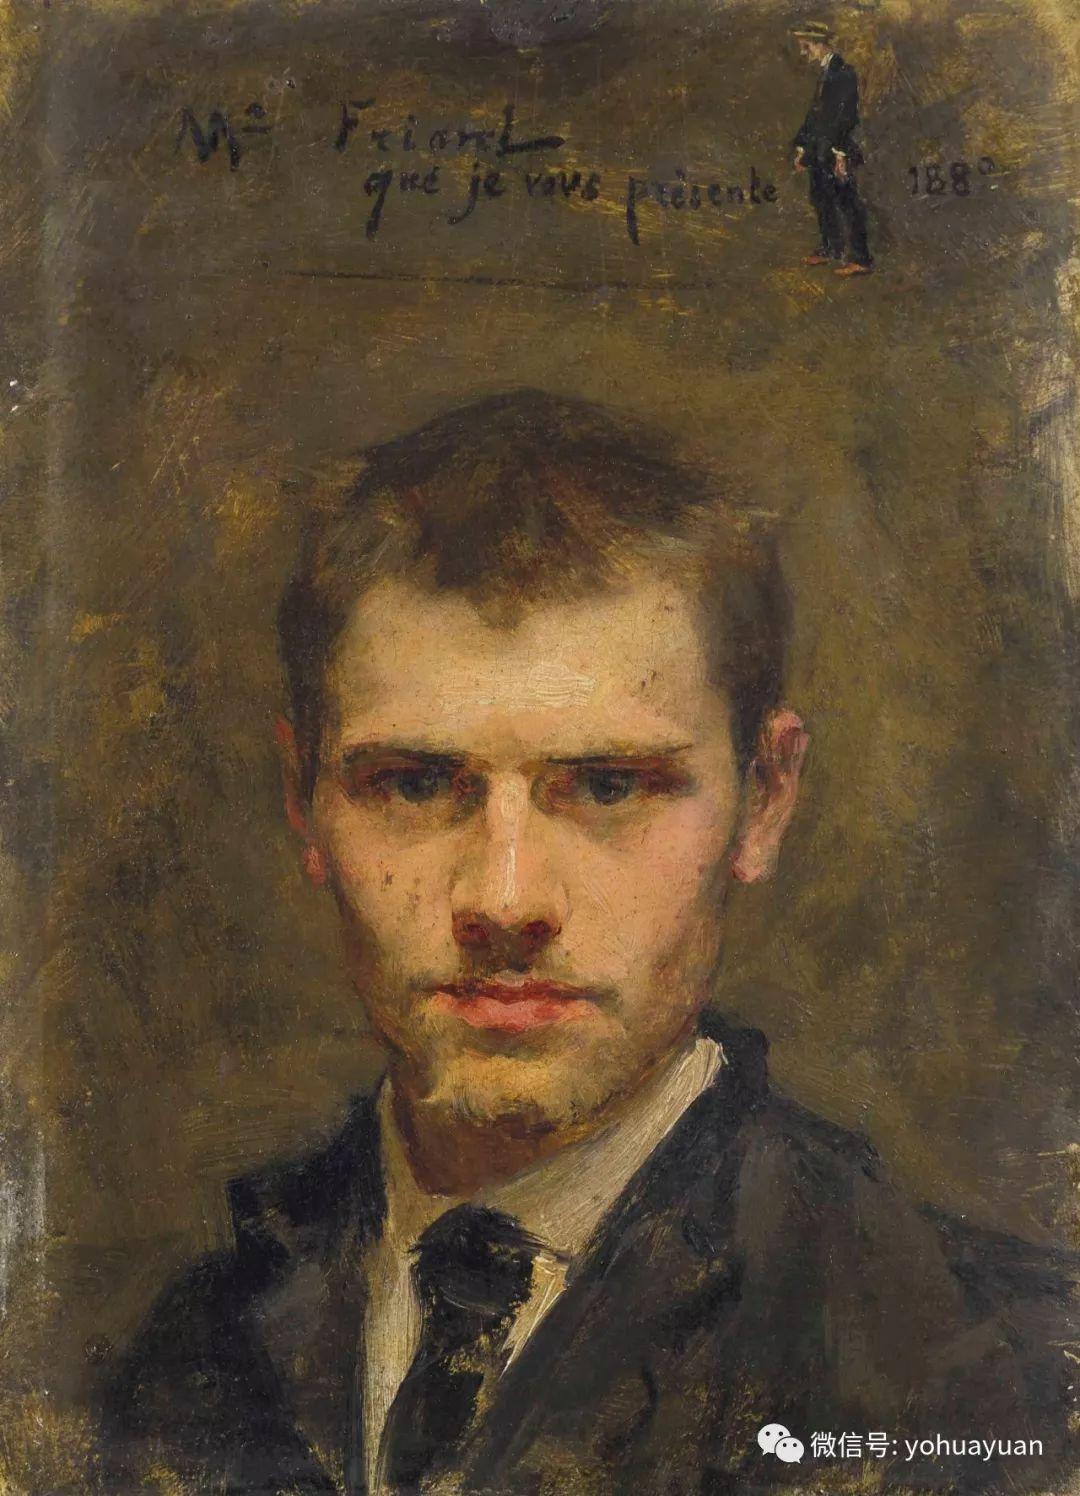 emilefriant_文化 正文  埃米尔·弗朗特(emile·friant1863年4月16日- 1932年6月9